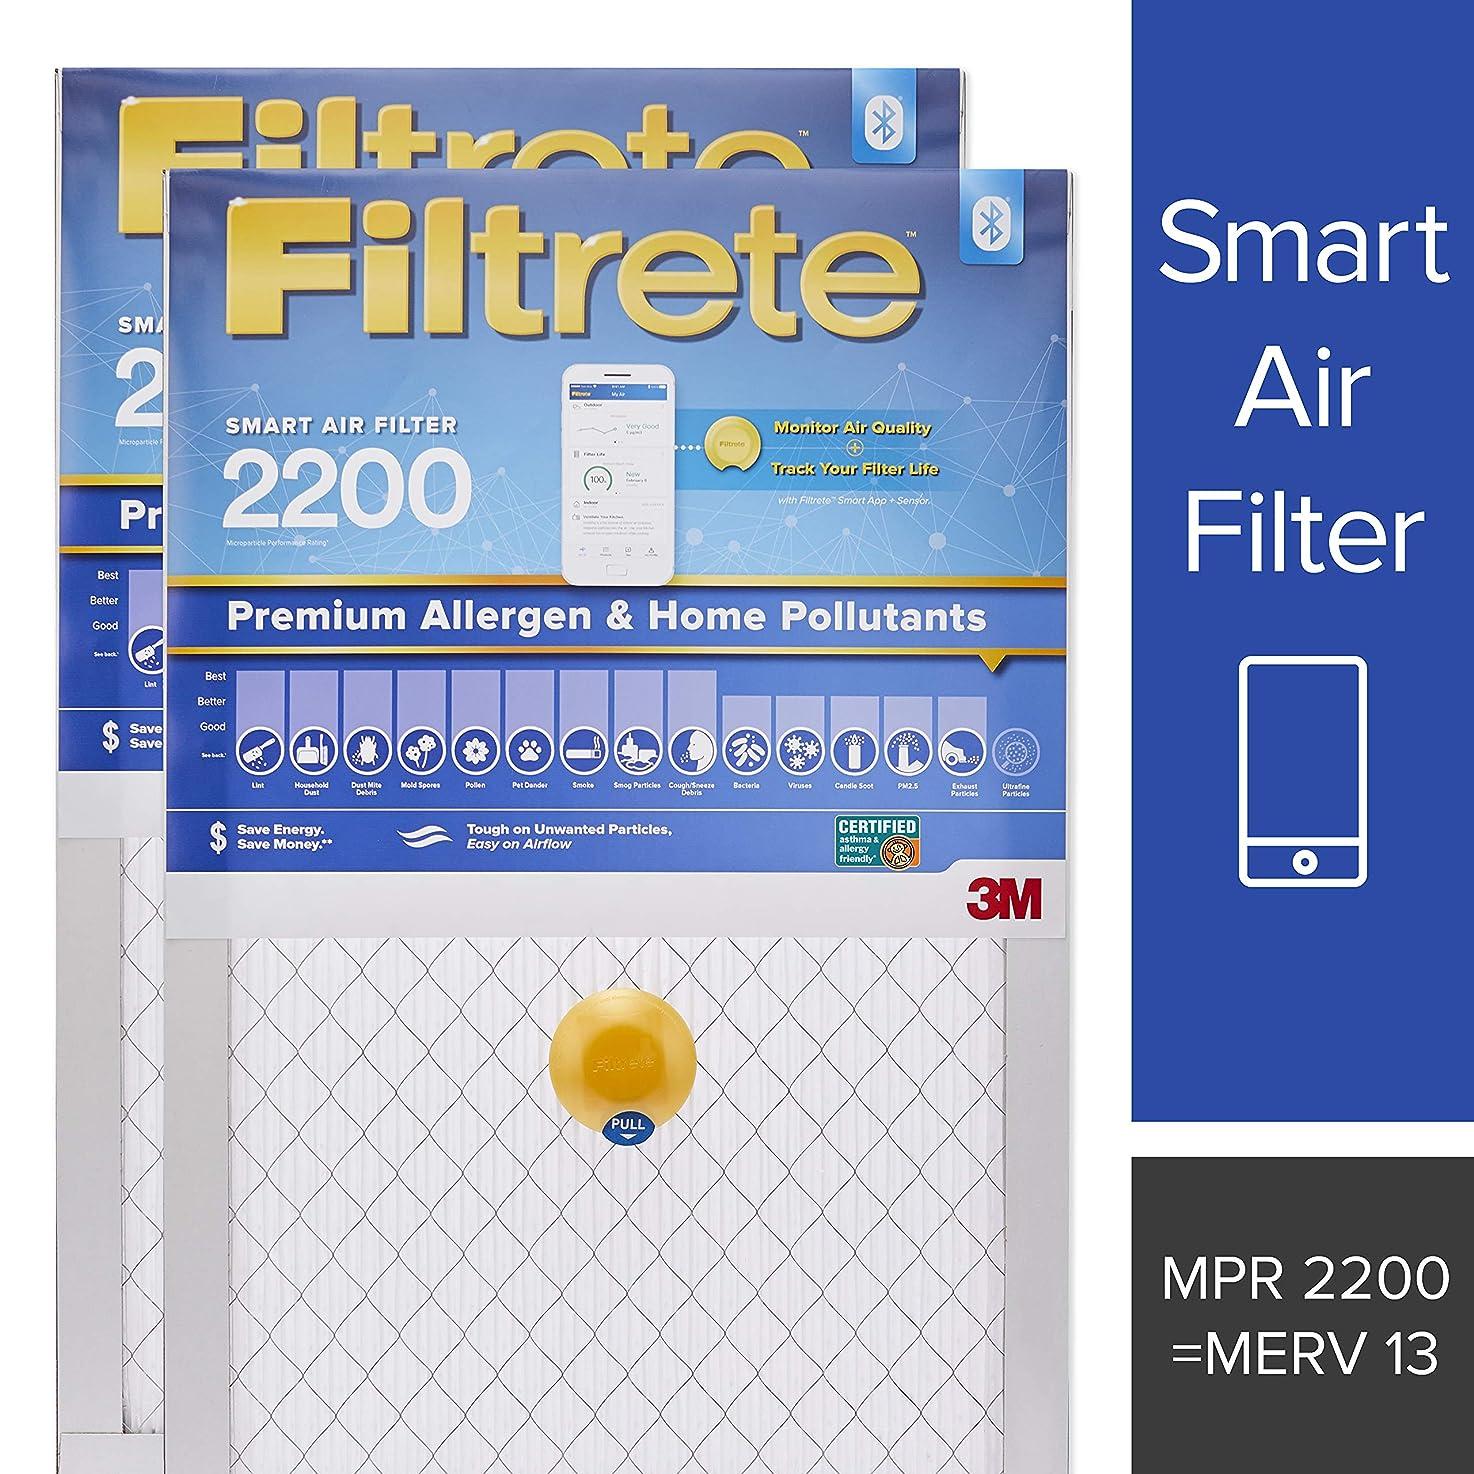 Filtrete 16x25x1 Smart Air Filter, MPR 2200, Premium Allergen & Home Pollutants AC Furnace Air Filter, 2-Pack teefvzrvvqlak8